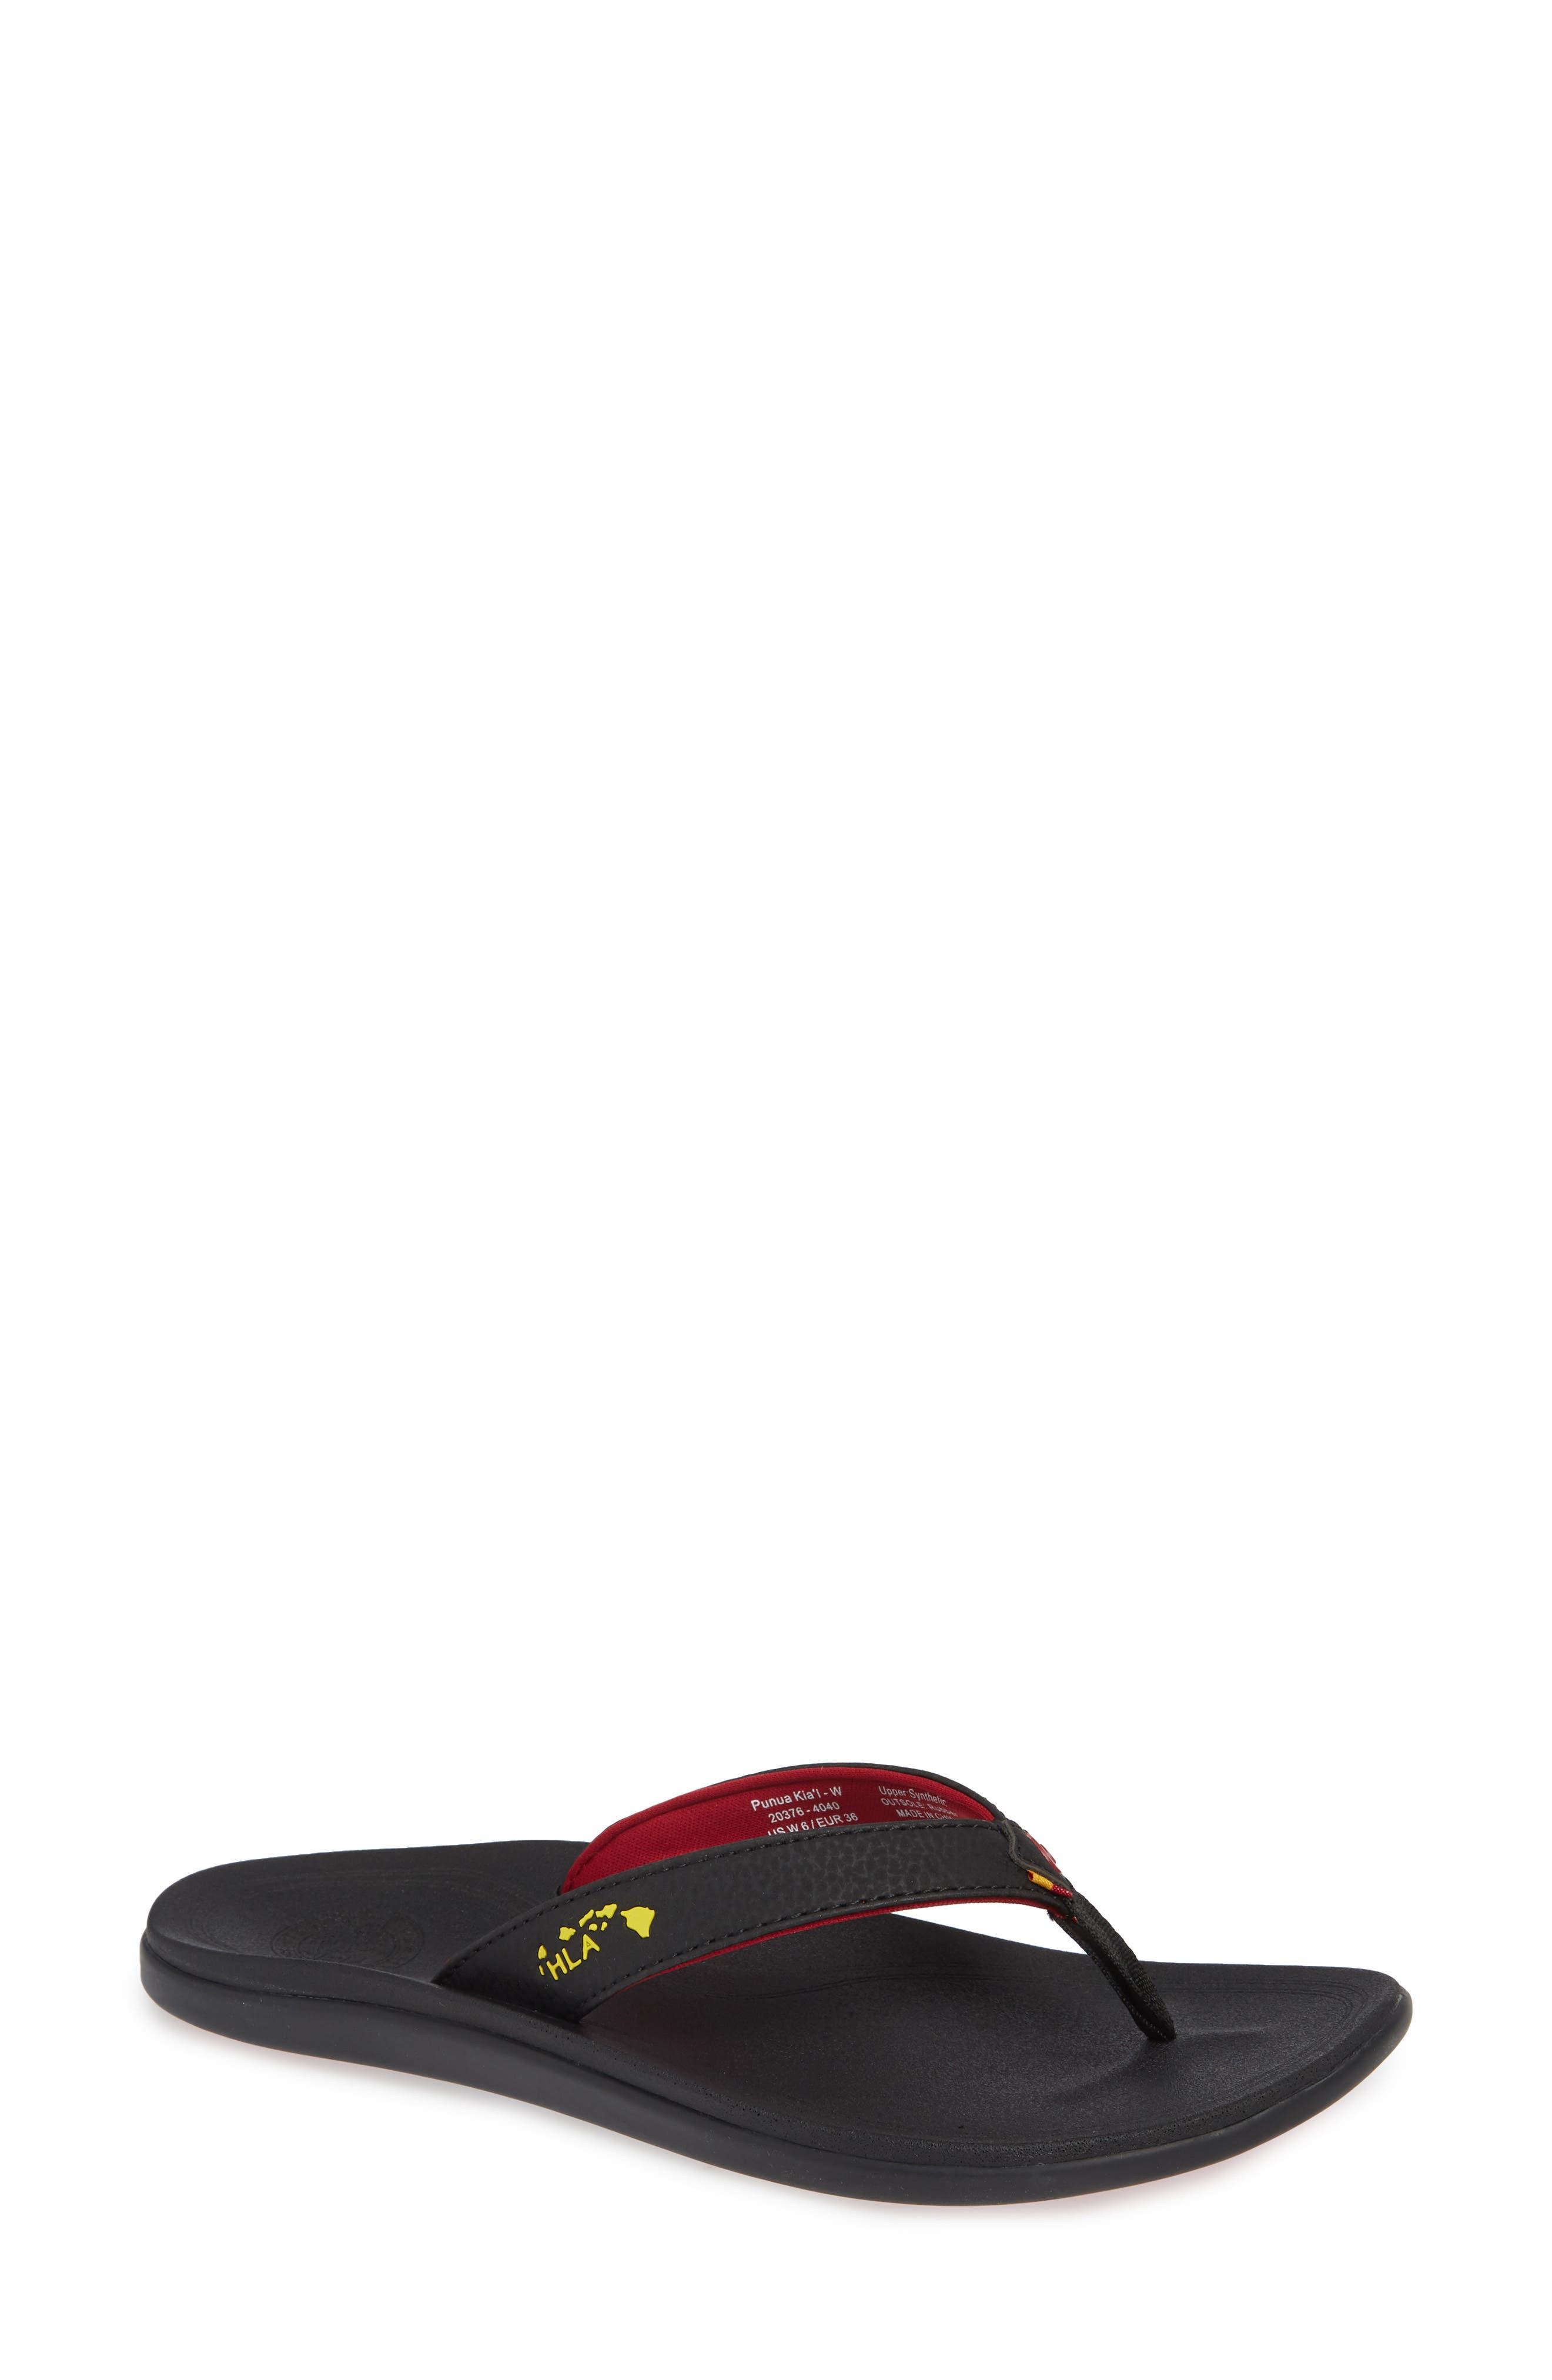 Punua Kiai Flip Flop,                         Main,                         color, BLACK/ BLACK FABRIC